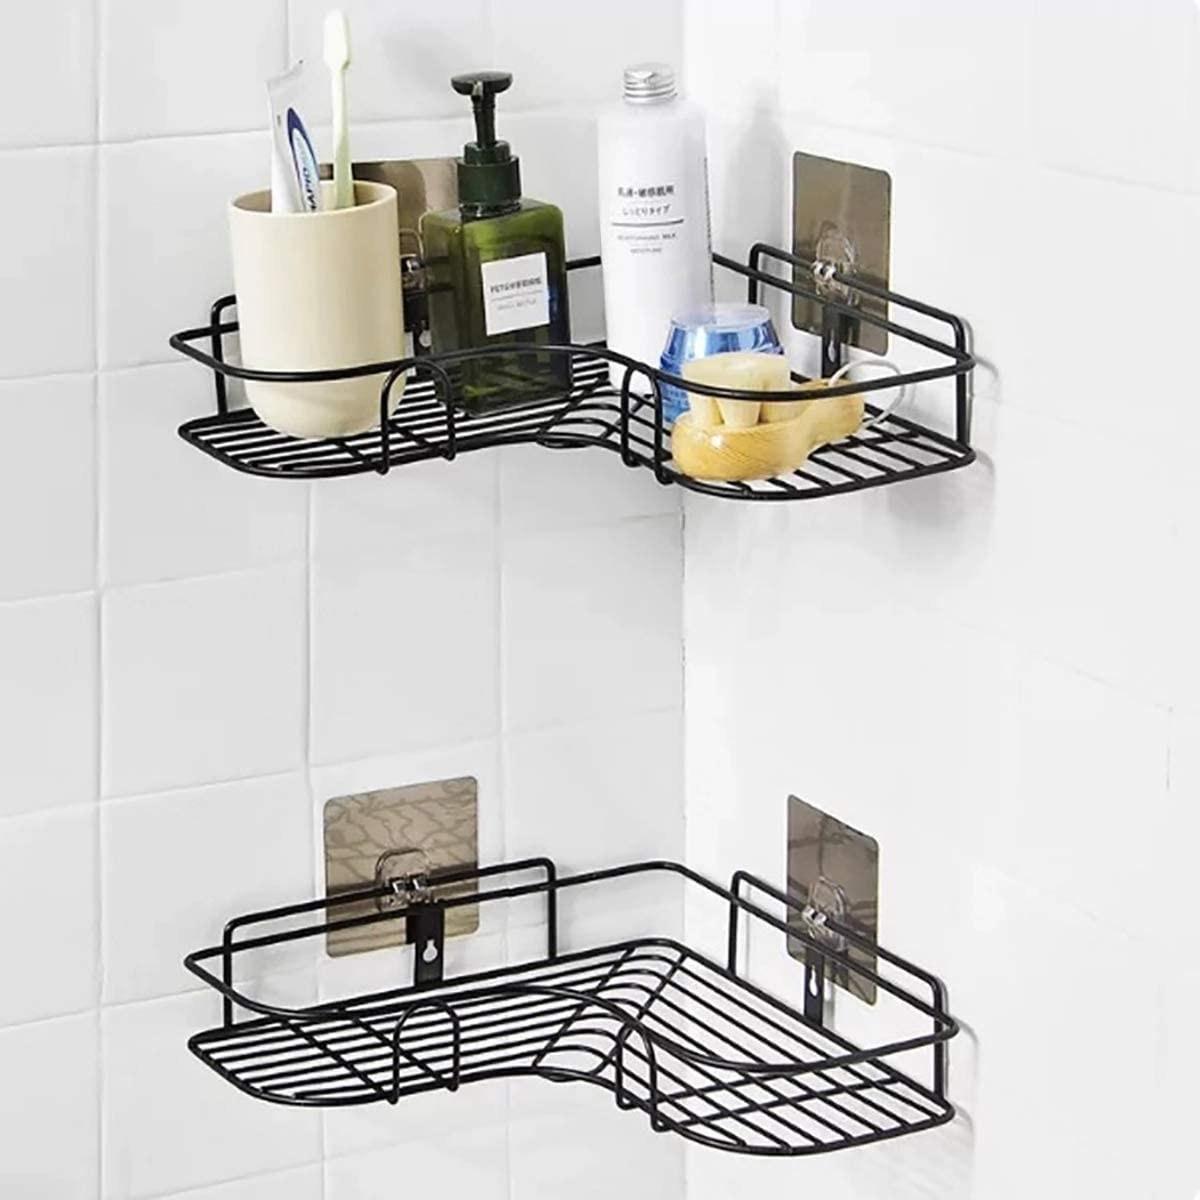 A corner shelf rack with items on it